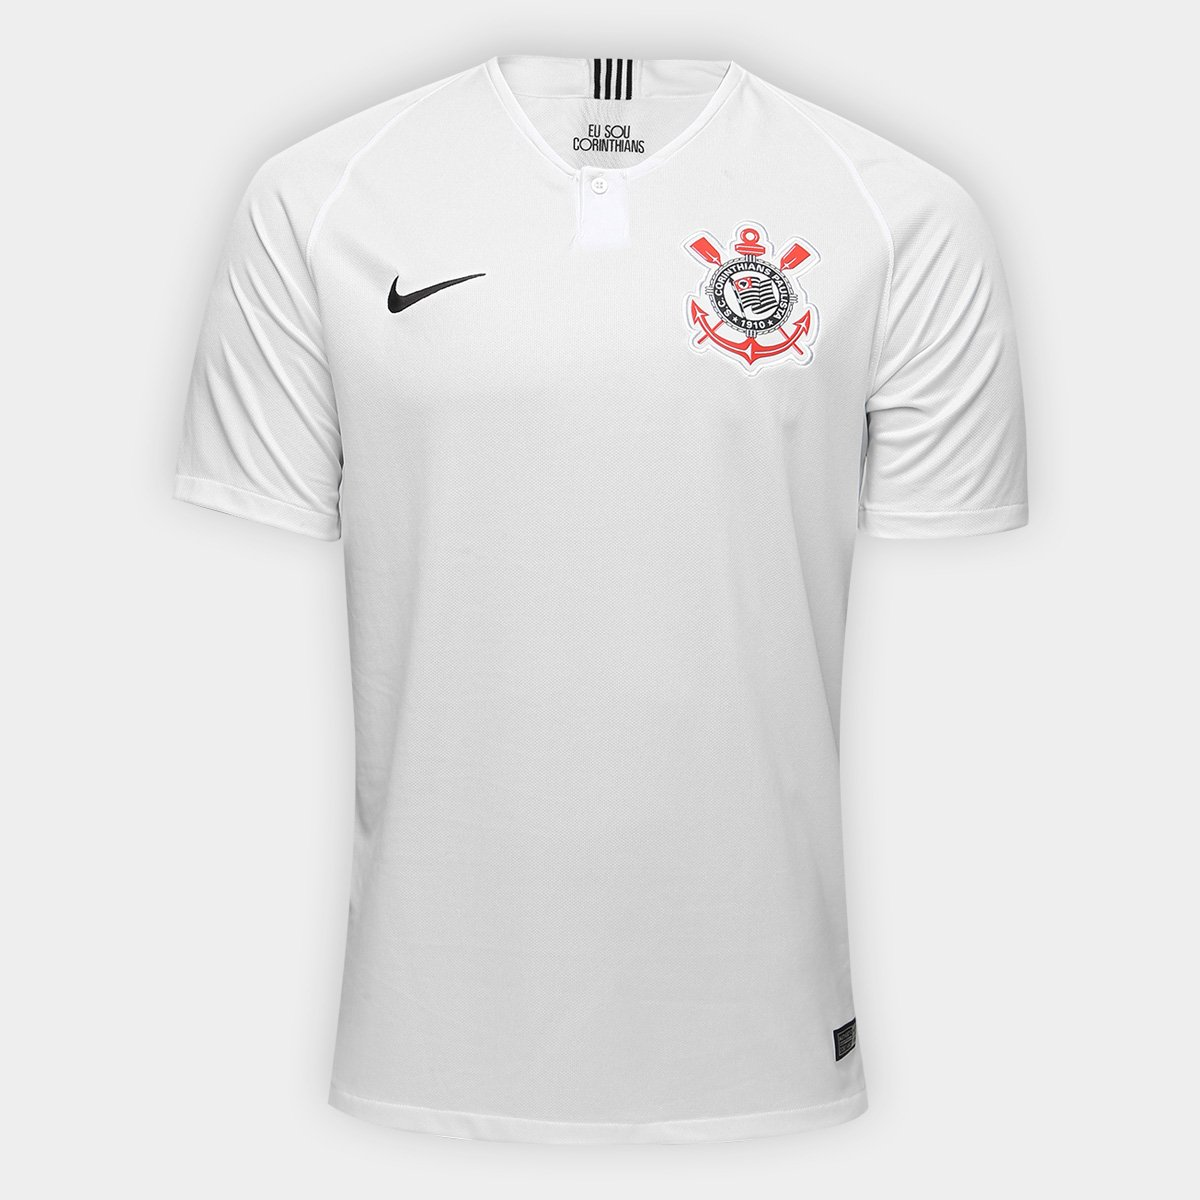 Camisa Corinthians I 18 19 s n° Torcedor Nike - Patch Democracia ... c852efc12921e